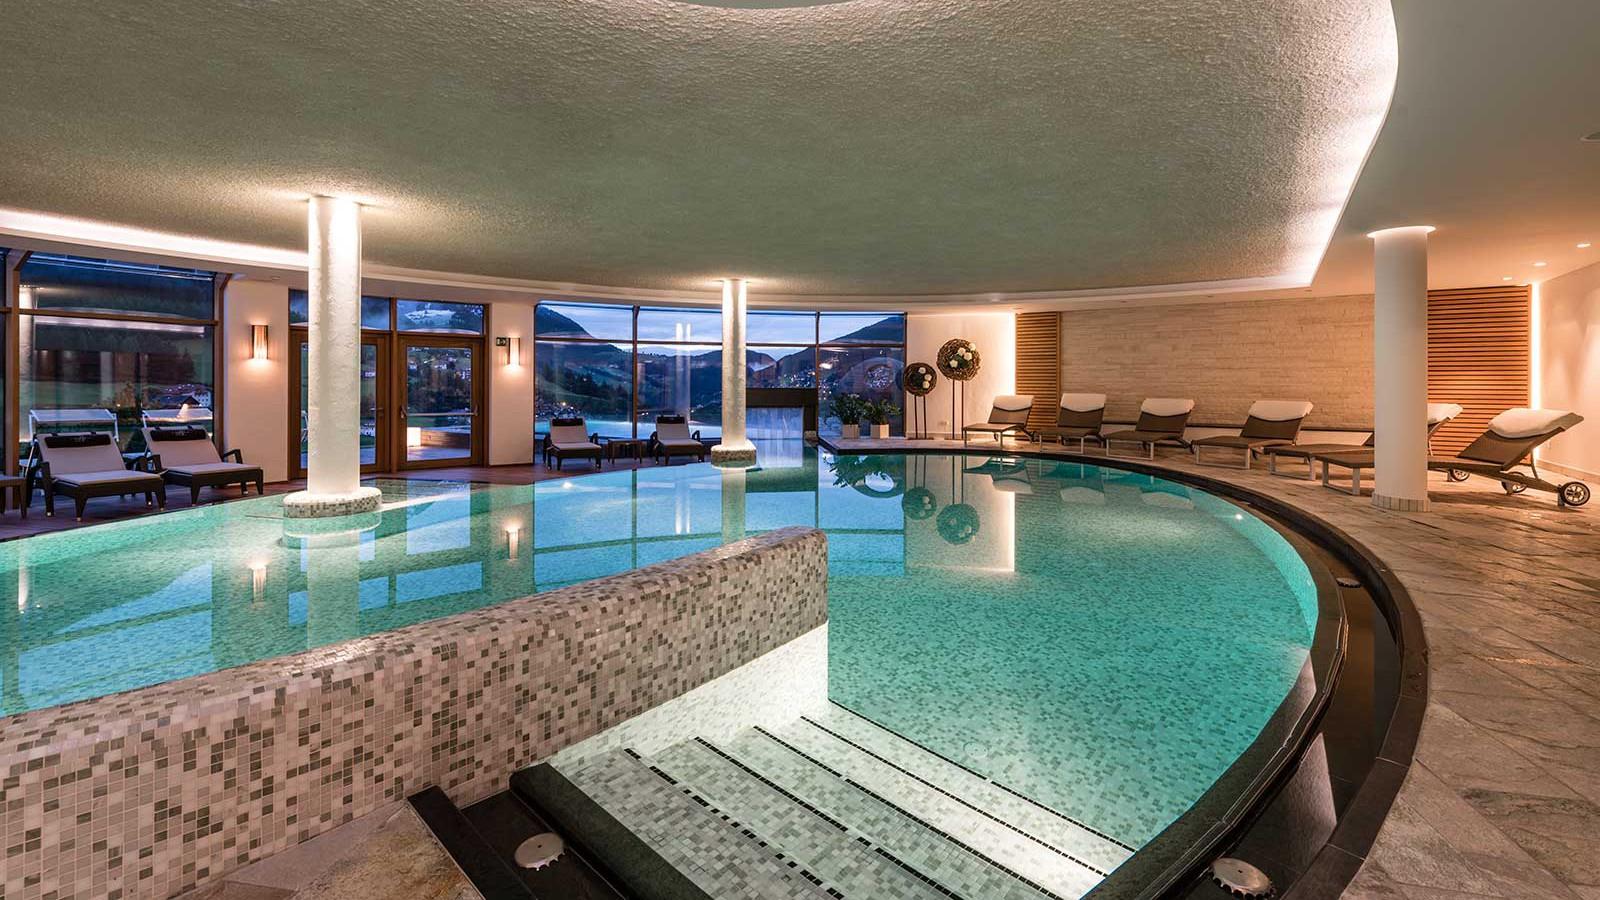 Alpenheim Charming Hotel - Interior Pool